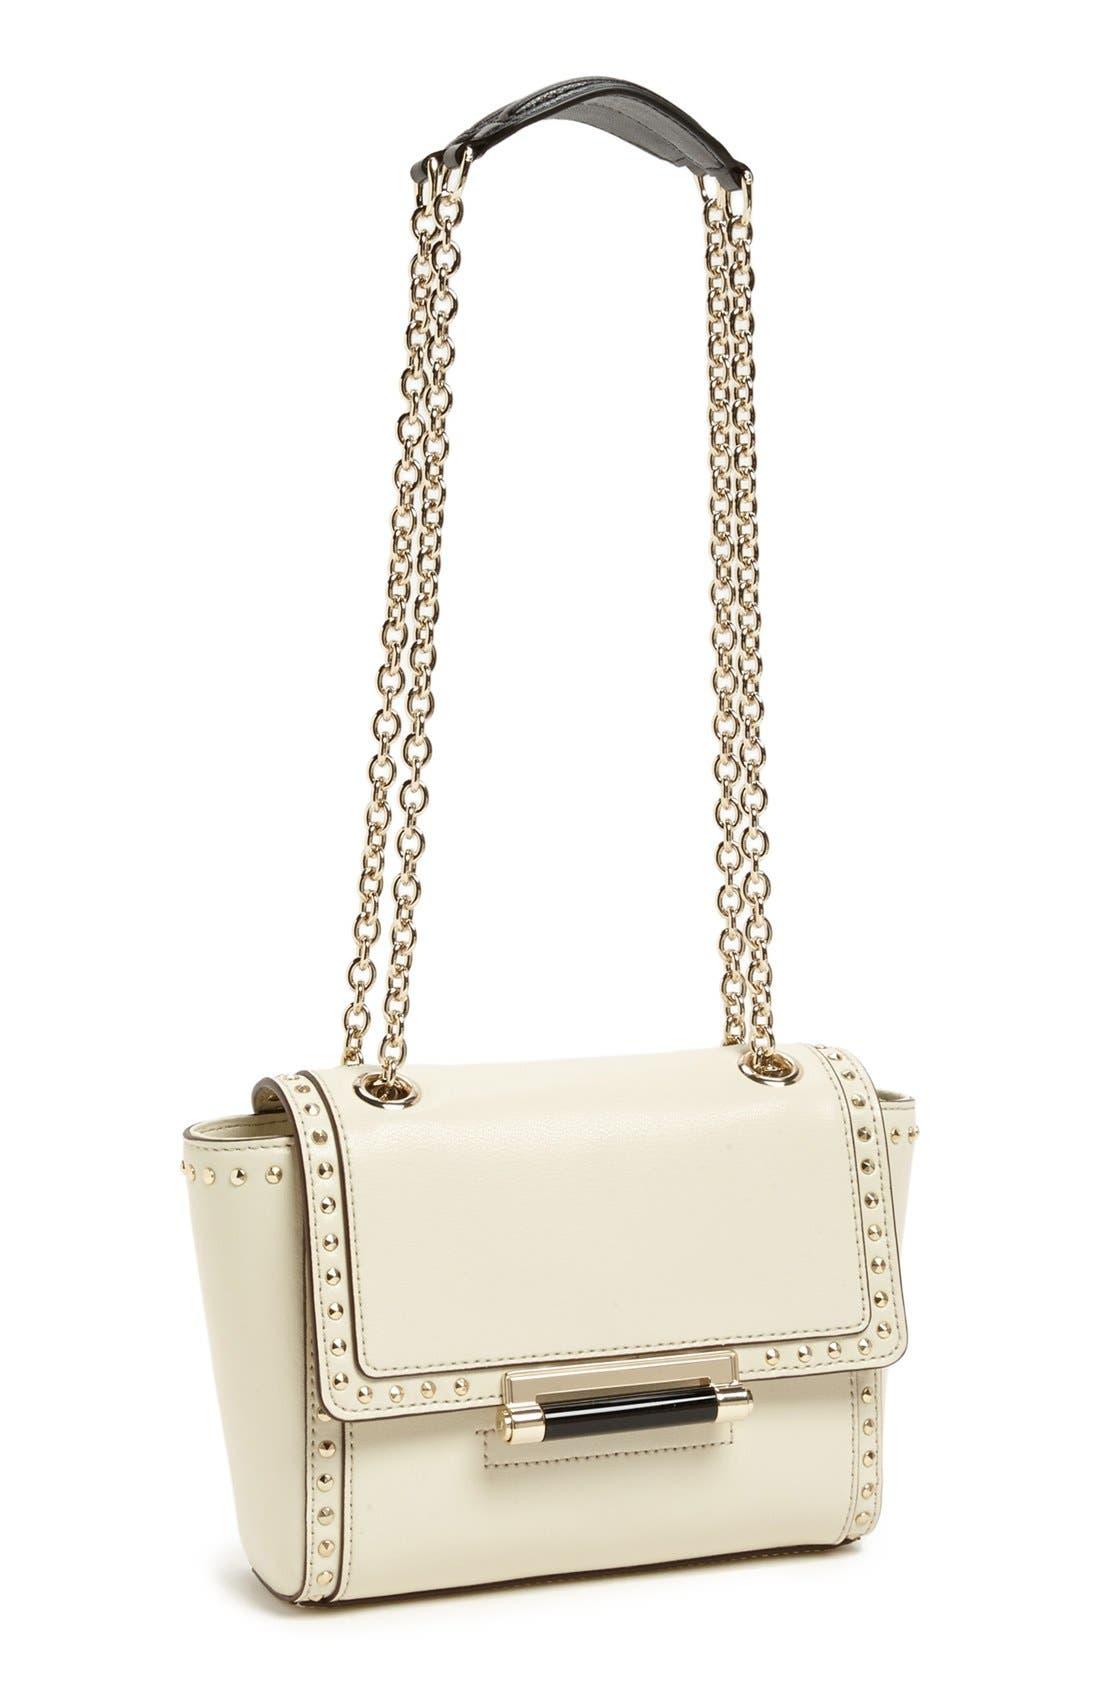 Alternate Image 1 Selected - Diane von Furstenberg '440 - Mini' Studded Crossbody Bag